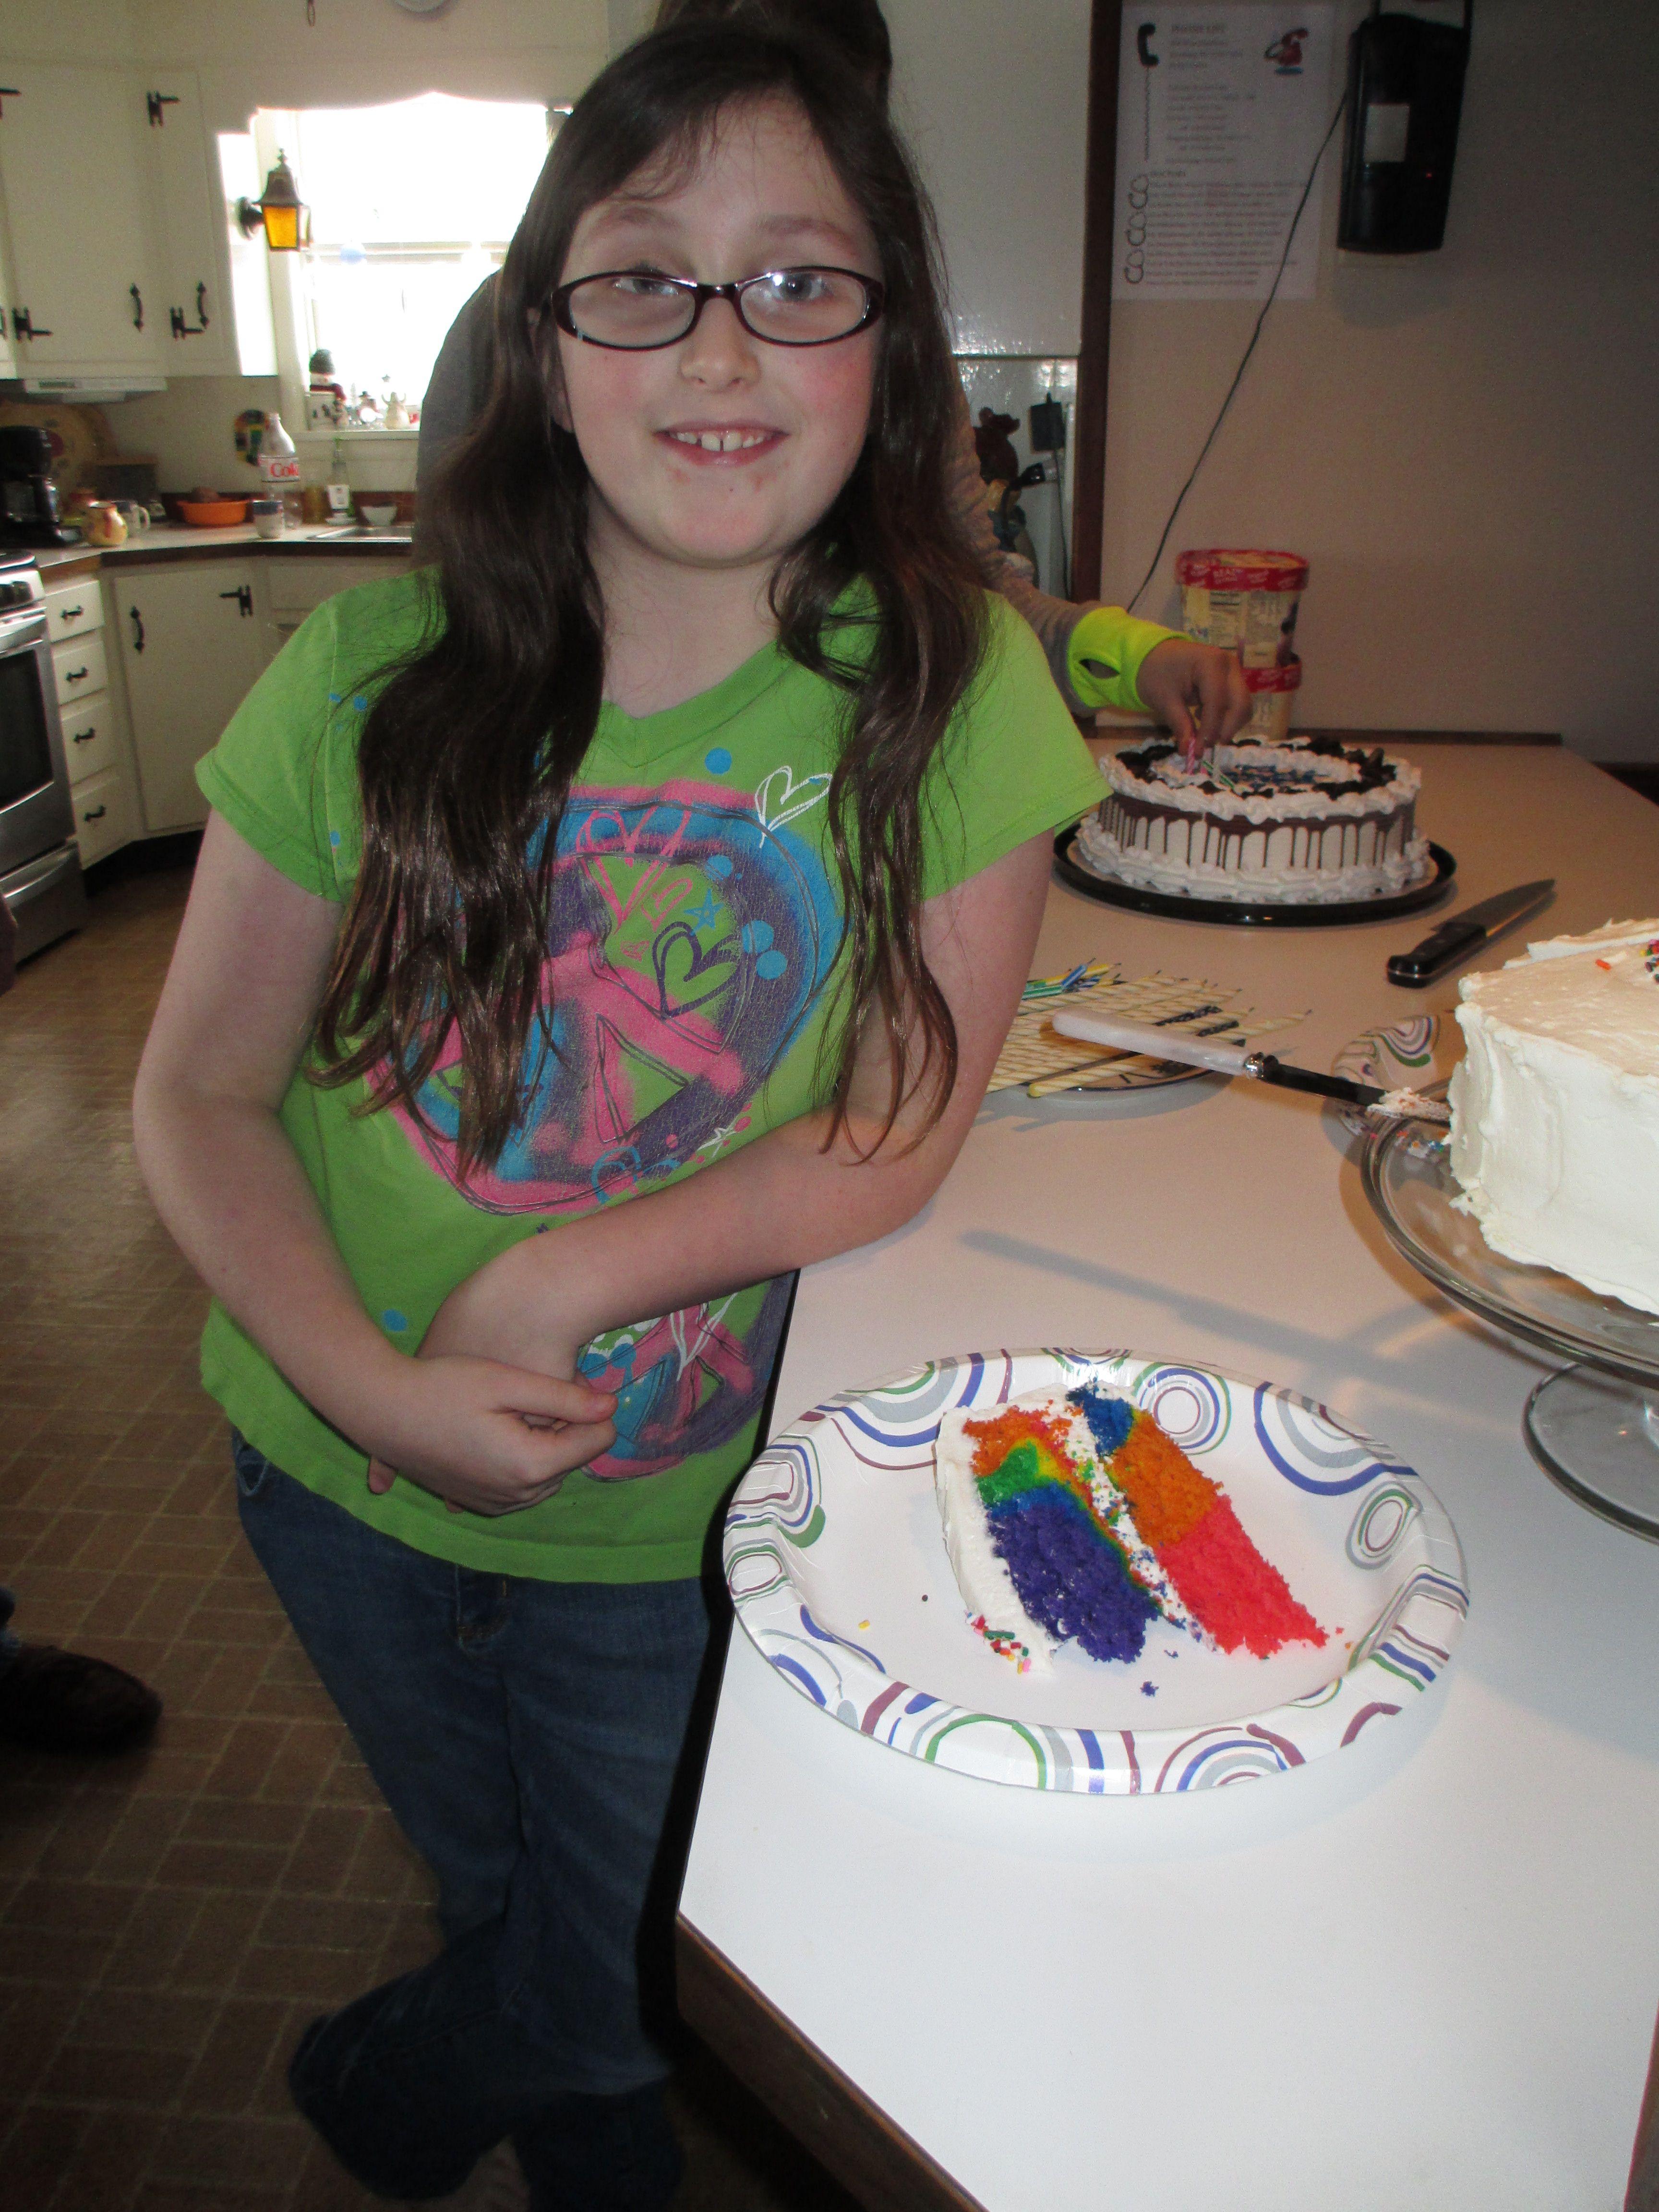 Becca's rainbow cake